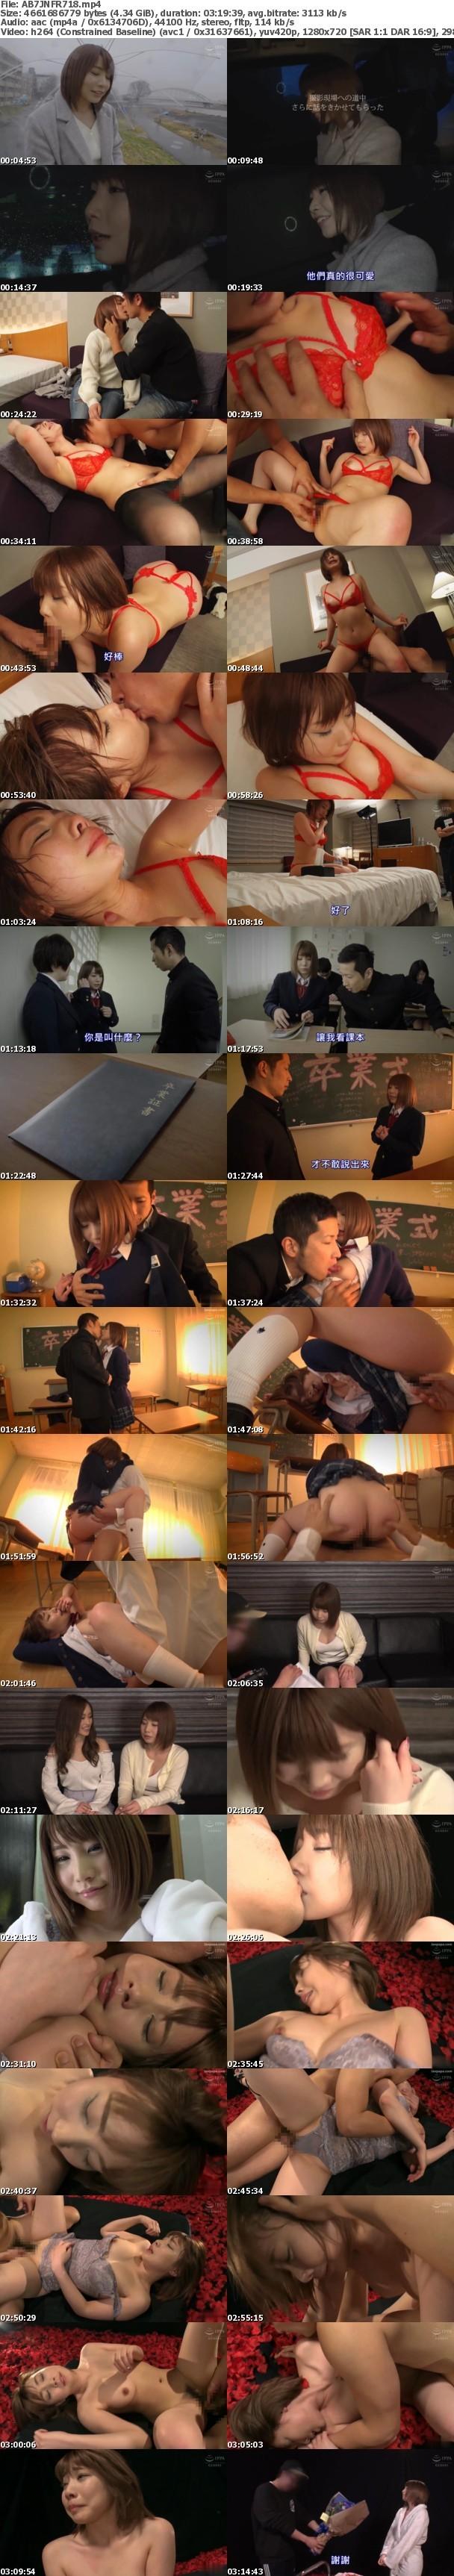 [HD] ABP-718 長谷川琉依 完全引退 在最棒的SEX裡回顧女優人生!![有碼高清中文字幕]